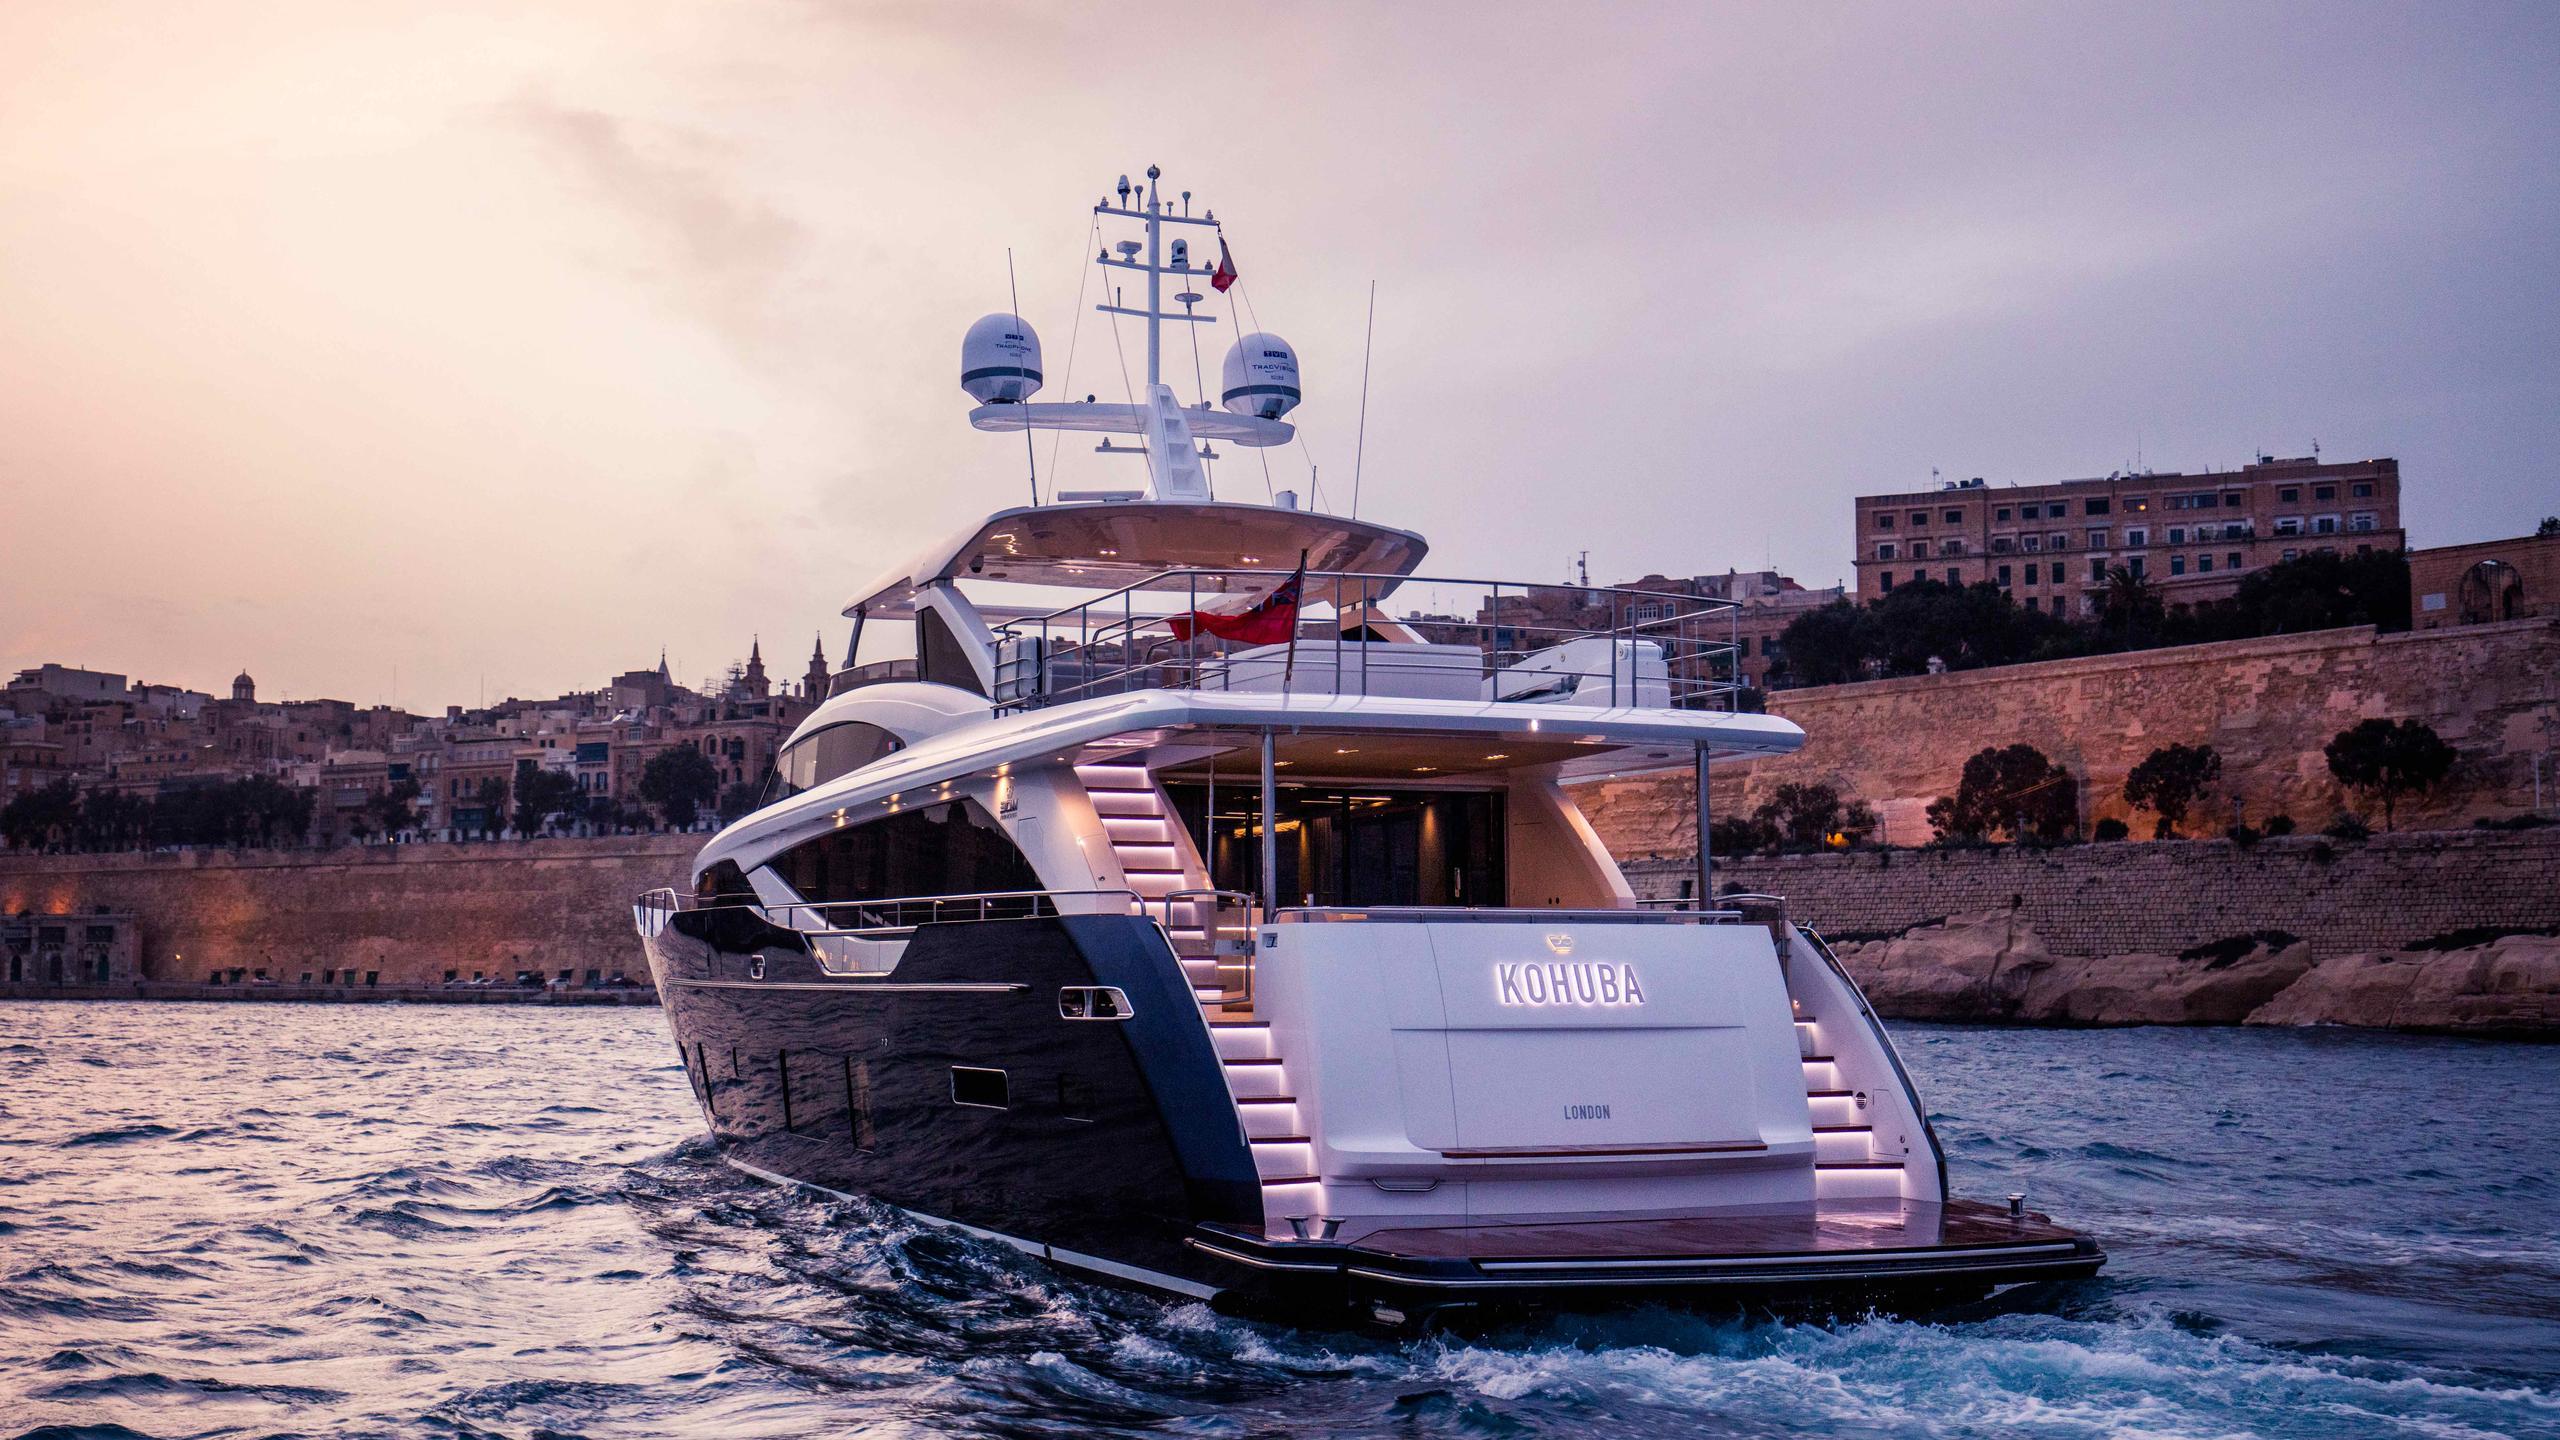 kohuba-motor-yacht-princess-2016-30m-stern-cruising